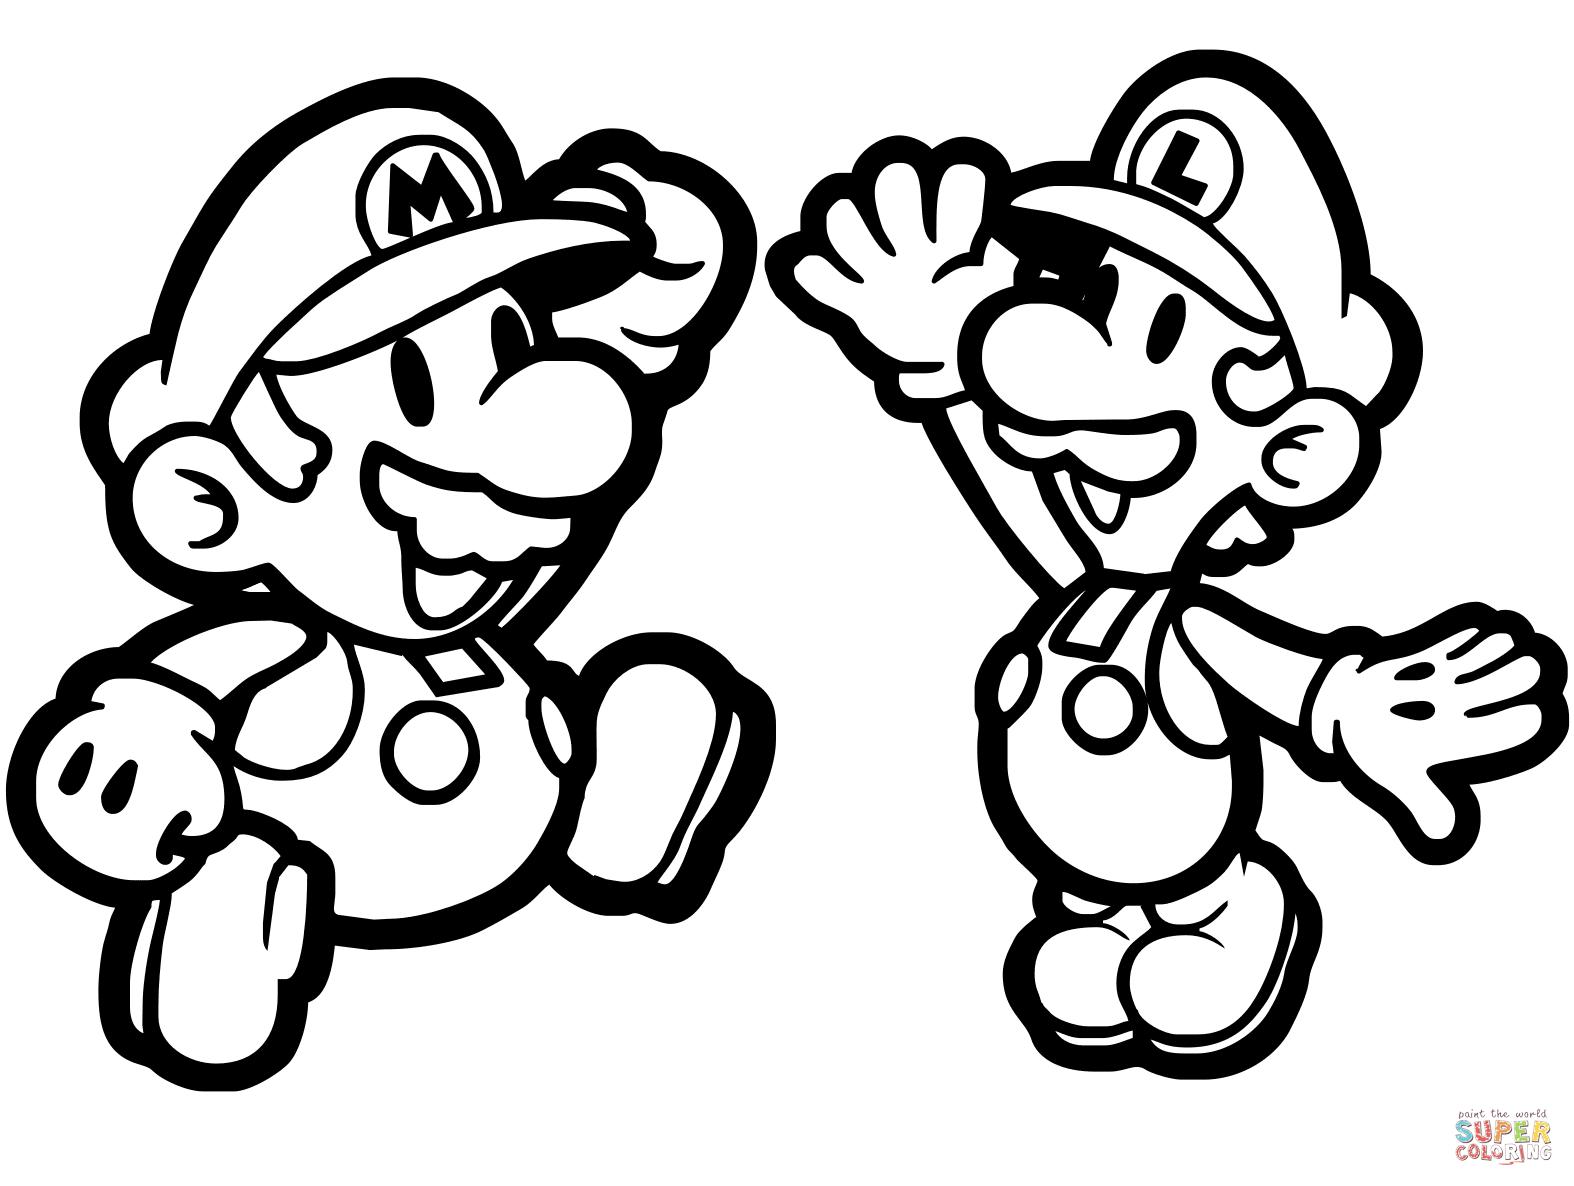 Mario And Luigi Coloring Page Coloring Home